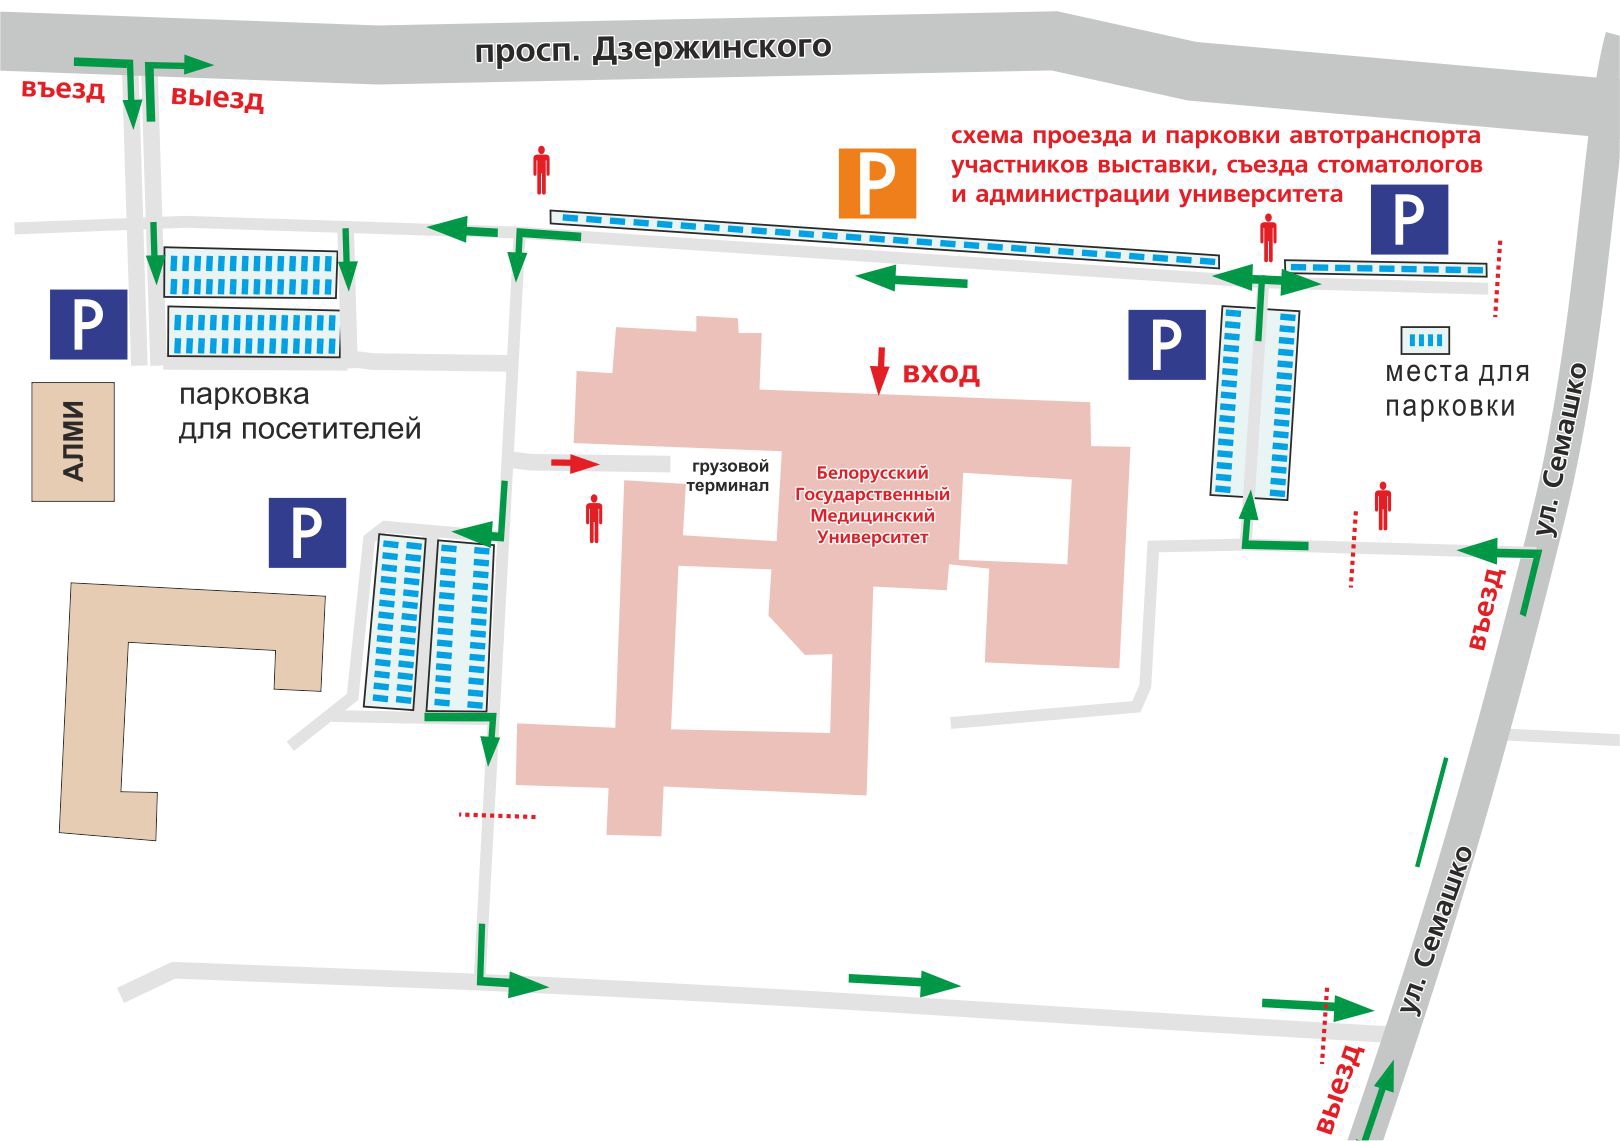 Схема проезда на парковки терминал f